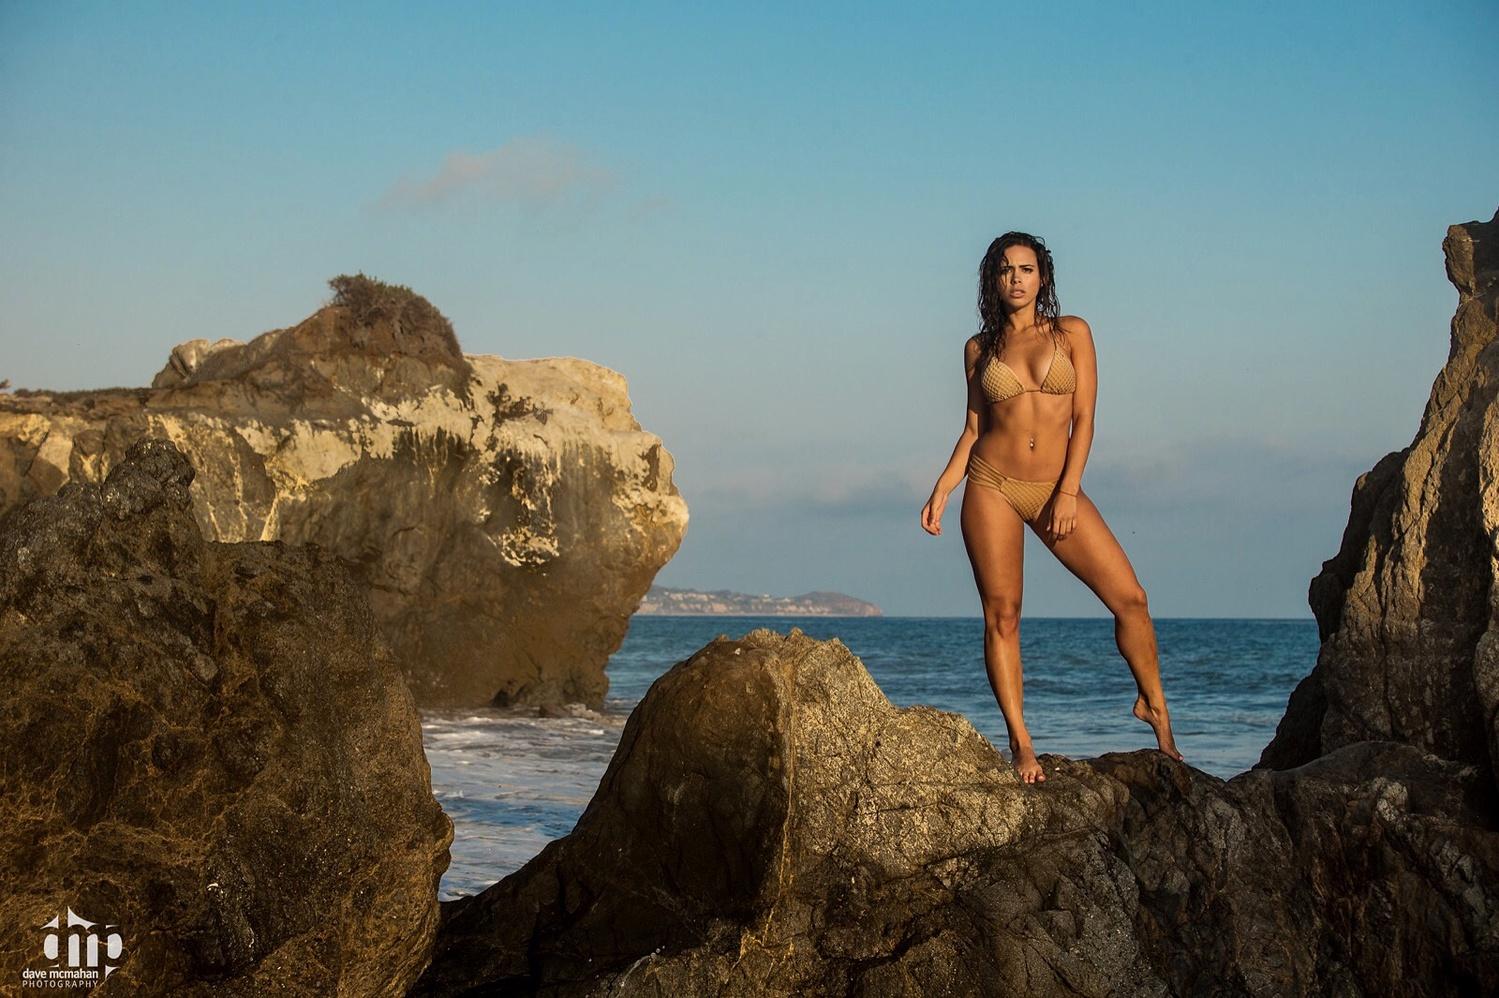 El Matador Bikini by Dave McMahan